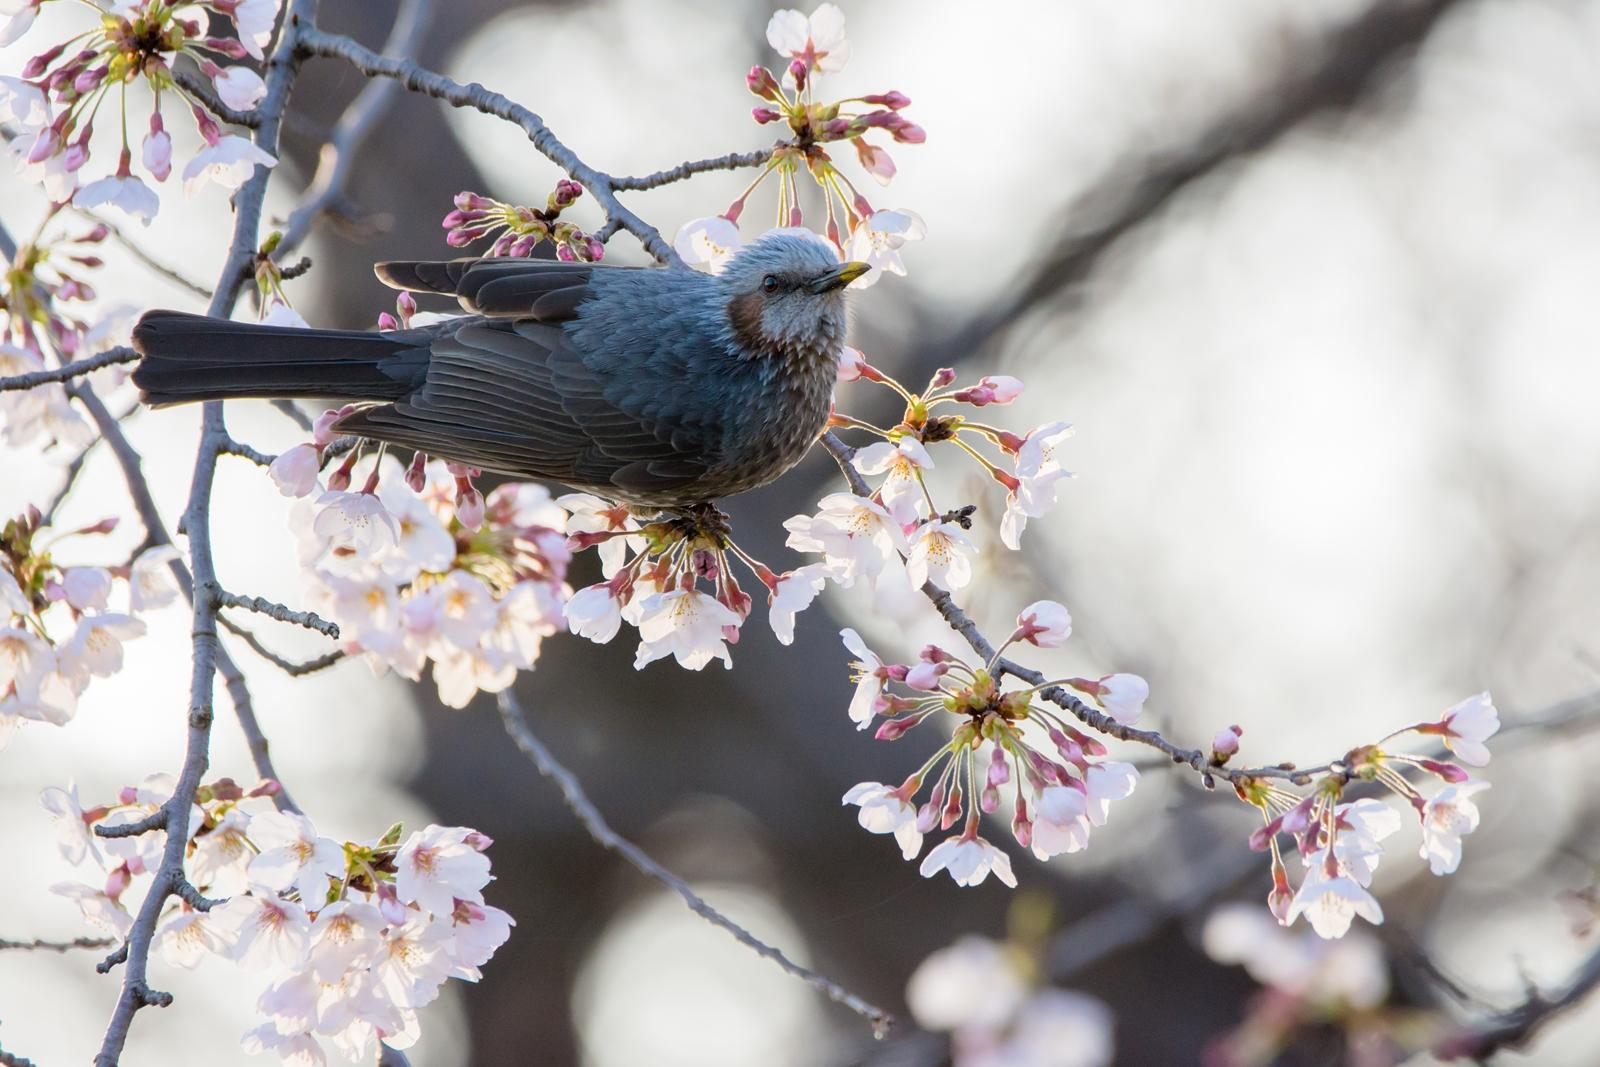 Photo: 「春の光」 / Spring shine.  待ちわびた光 喜びの光 世界が春の光に 包まれていく  Brown-eared Bulbul. (ヒヨドリ)  Nikon D7200 SIGMA 150-600mm F5-6.3 DG OS HSM Contemporary  #birdphotography #birds #kawaii #小鳥 #nikon #sigma #小鳥グラファー  ( http://takafumiooshio.com/archives/1375 )